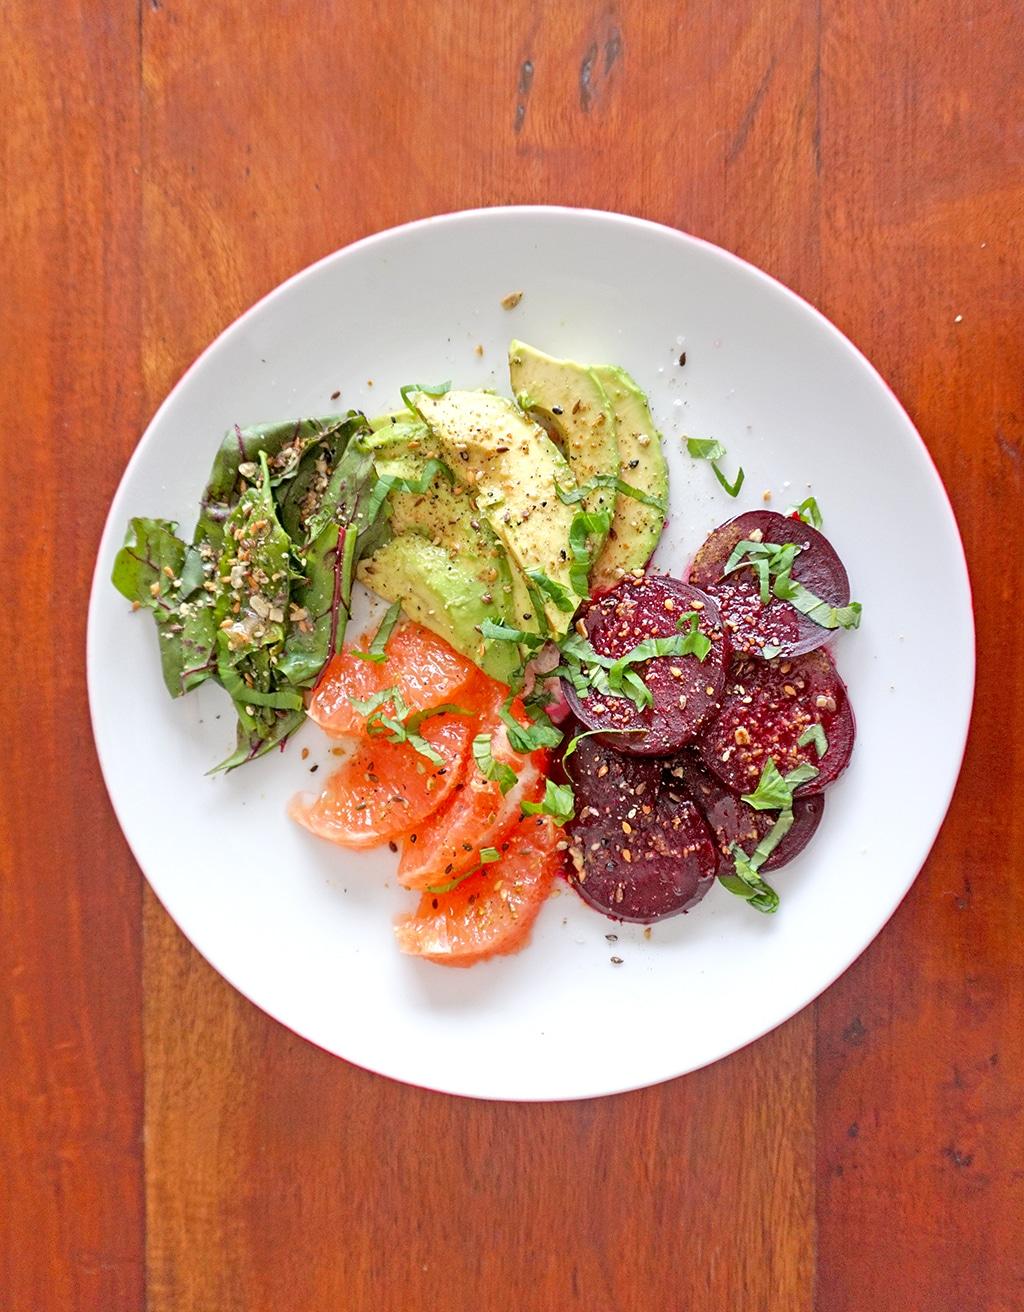 Beet, Citrus and Avocado Salad